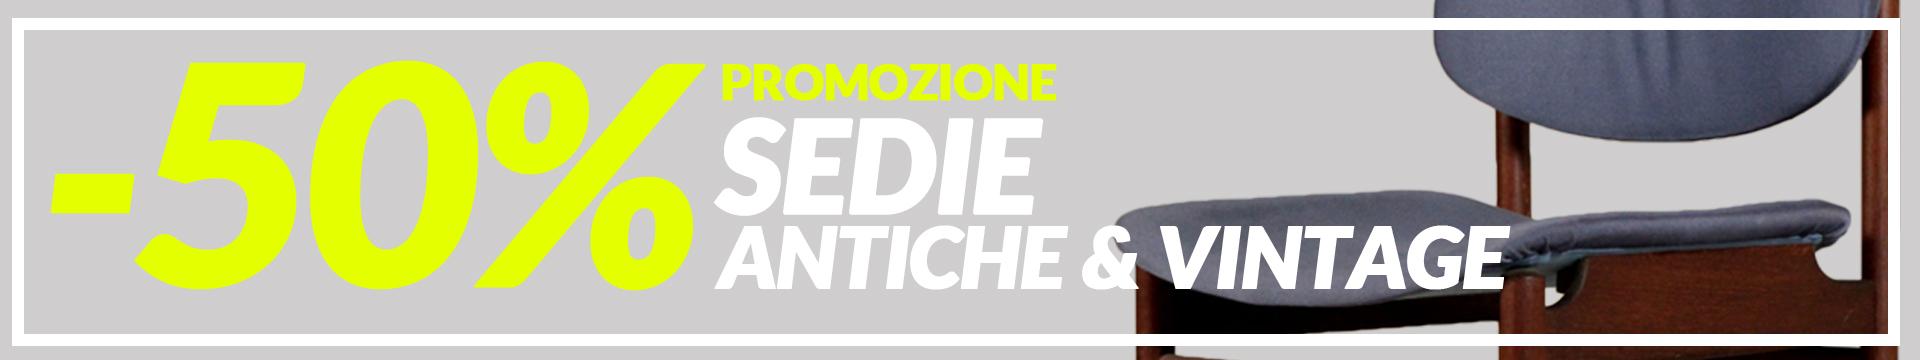 Promozione Sedie Antiche & Vintage -50%